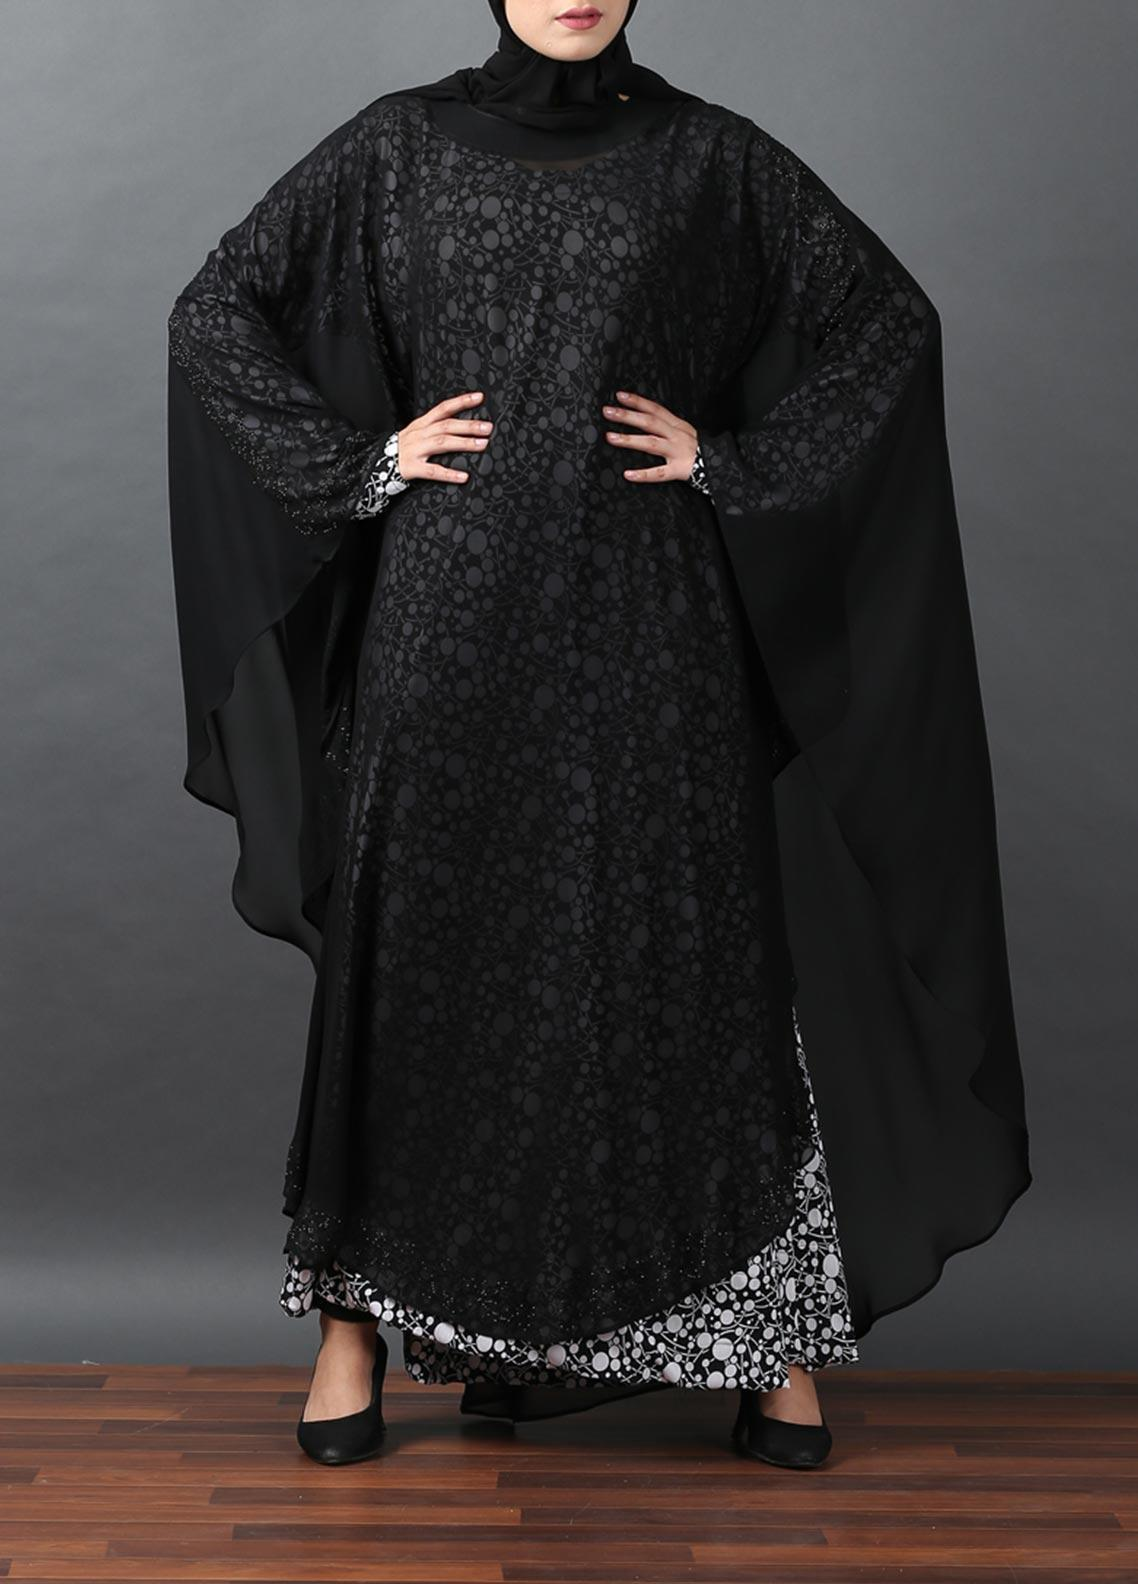 Hijab ul Hareem Jilbab Chiffon Stitched Abaya JILBAB-RC-A314